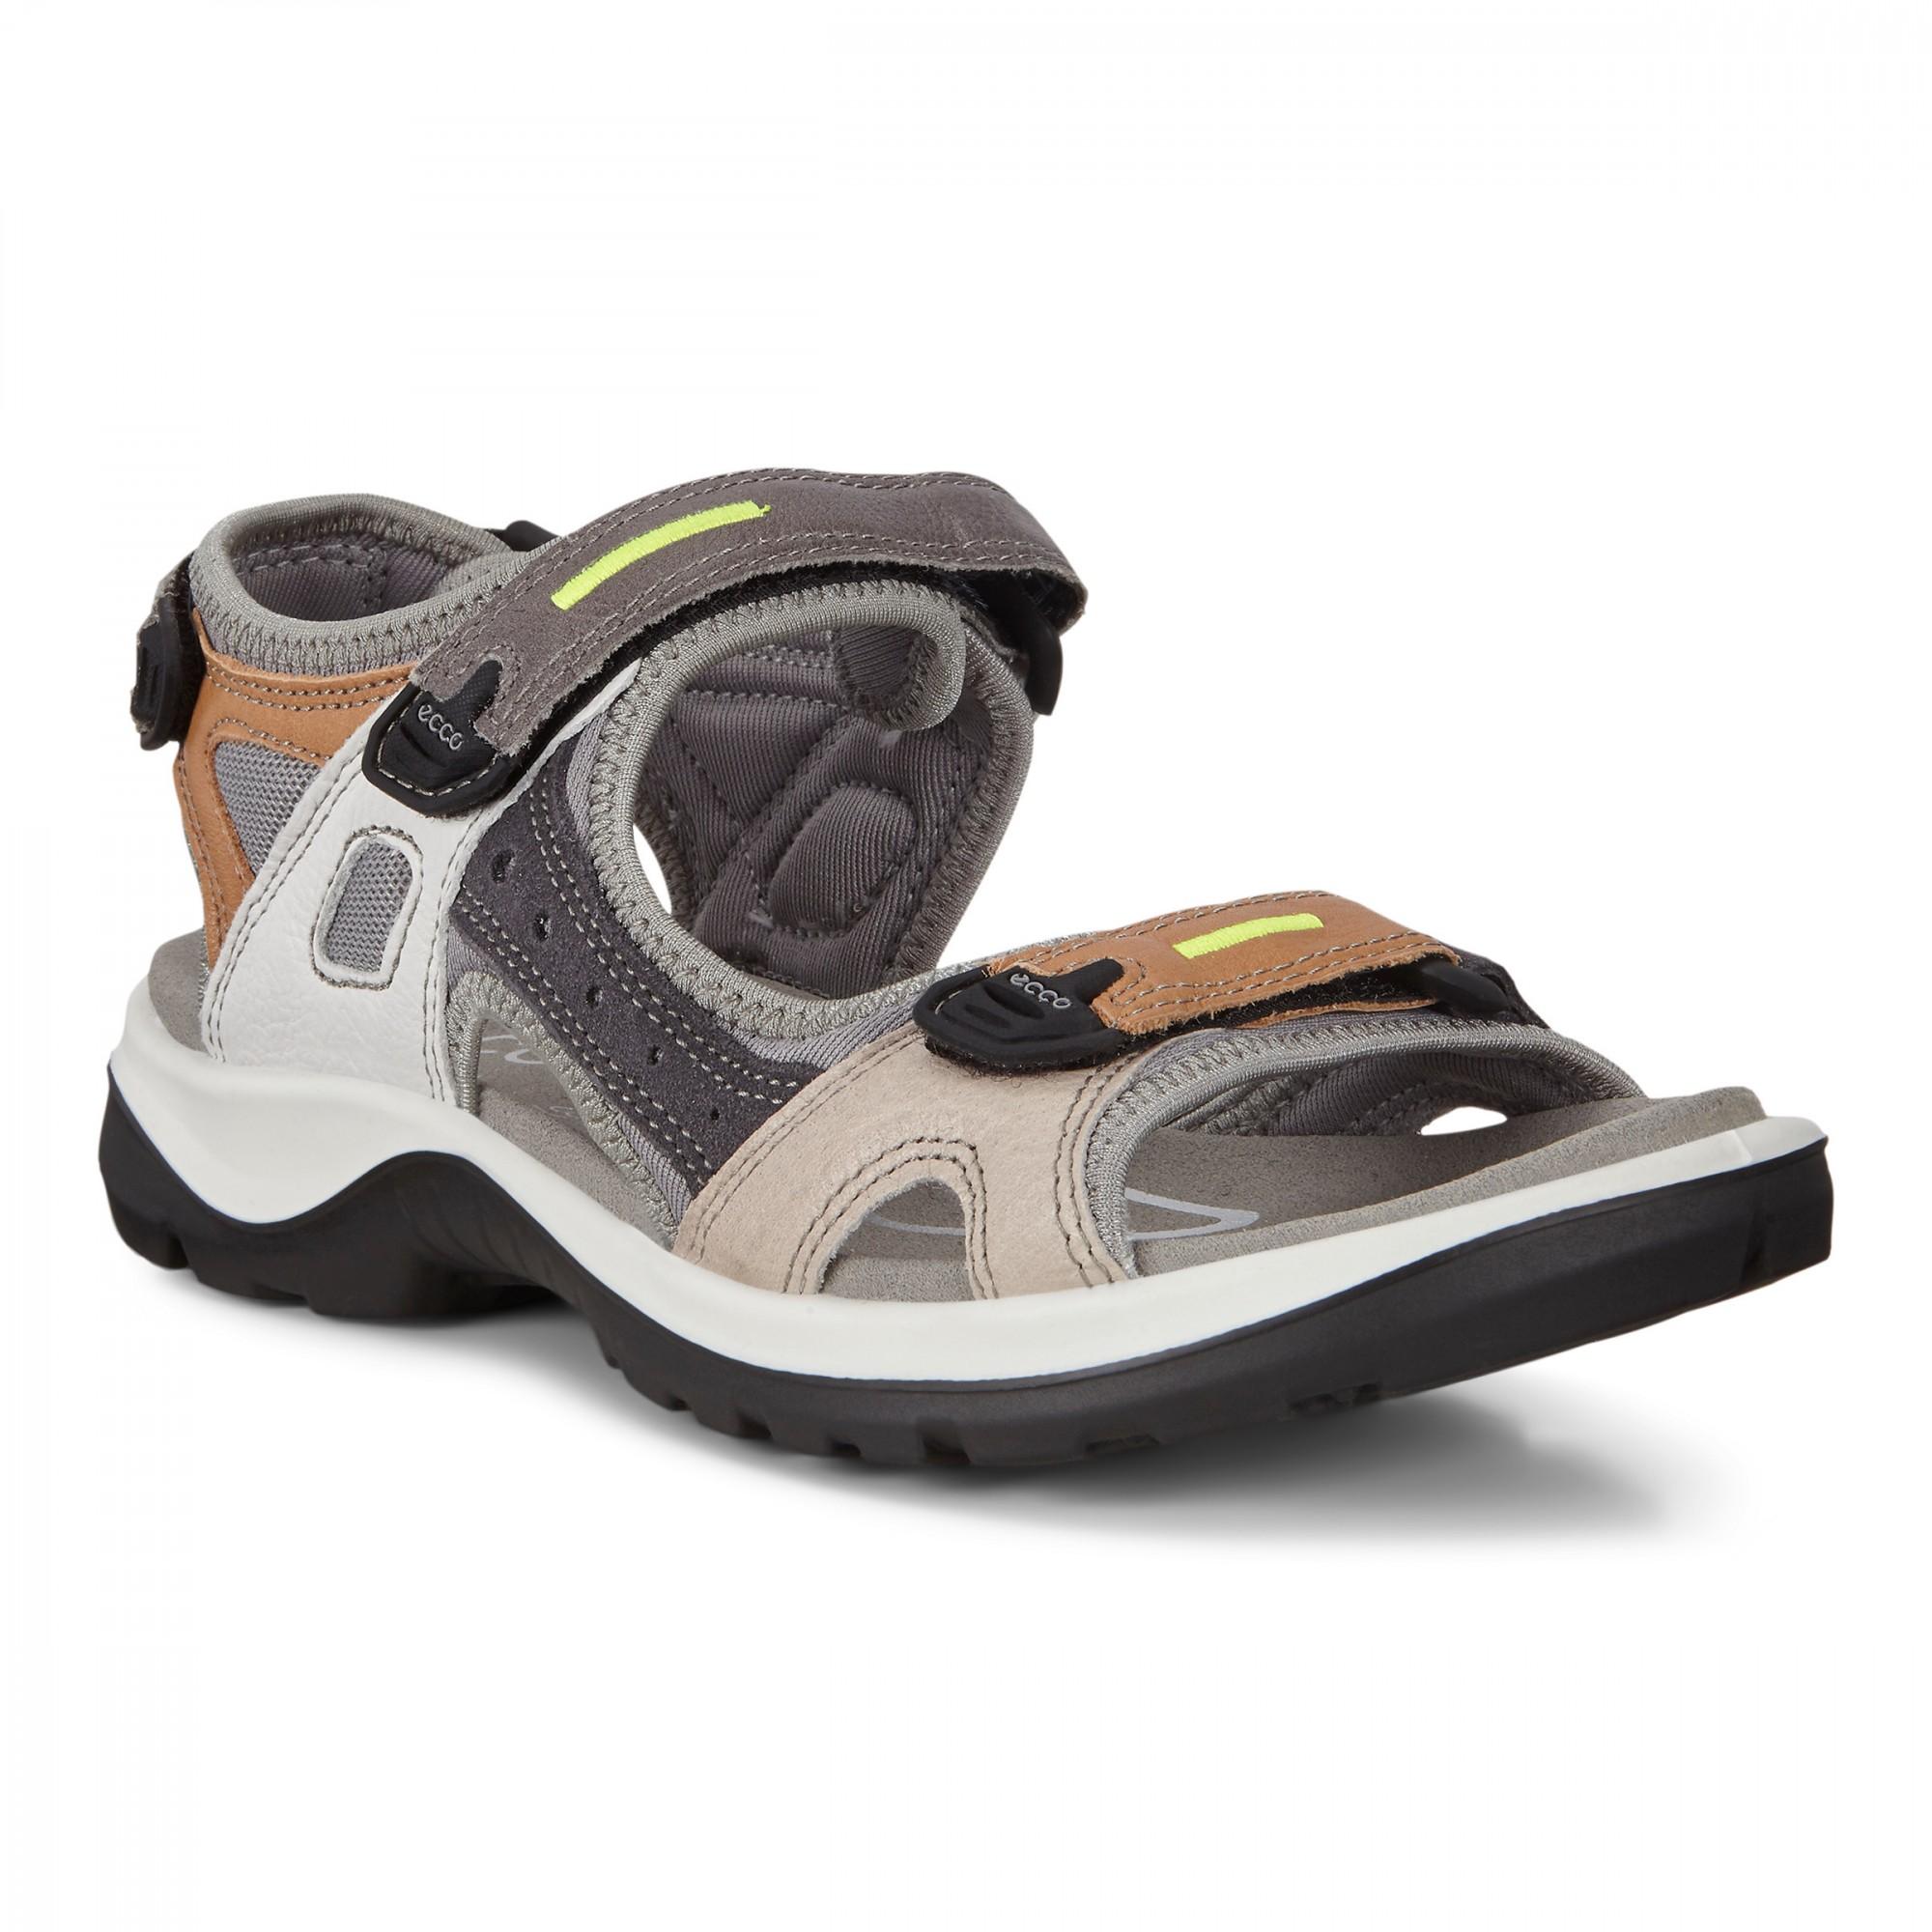 ECCO off road frau sandal